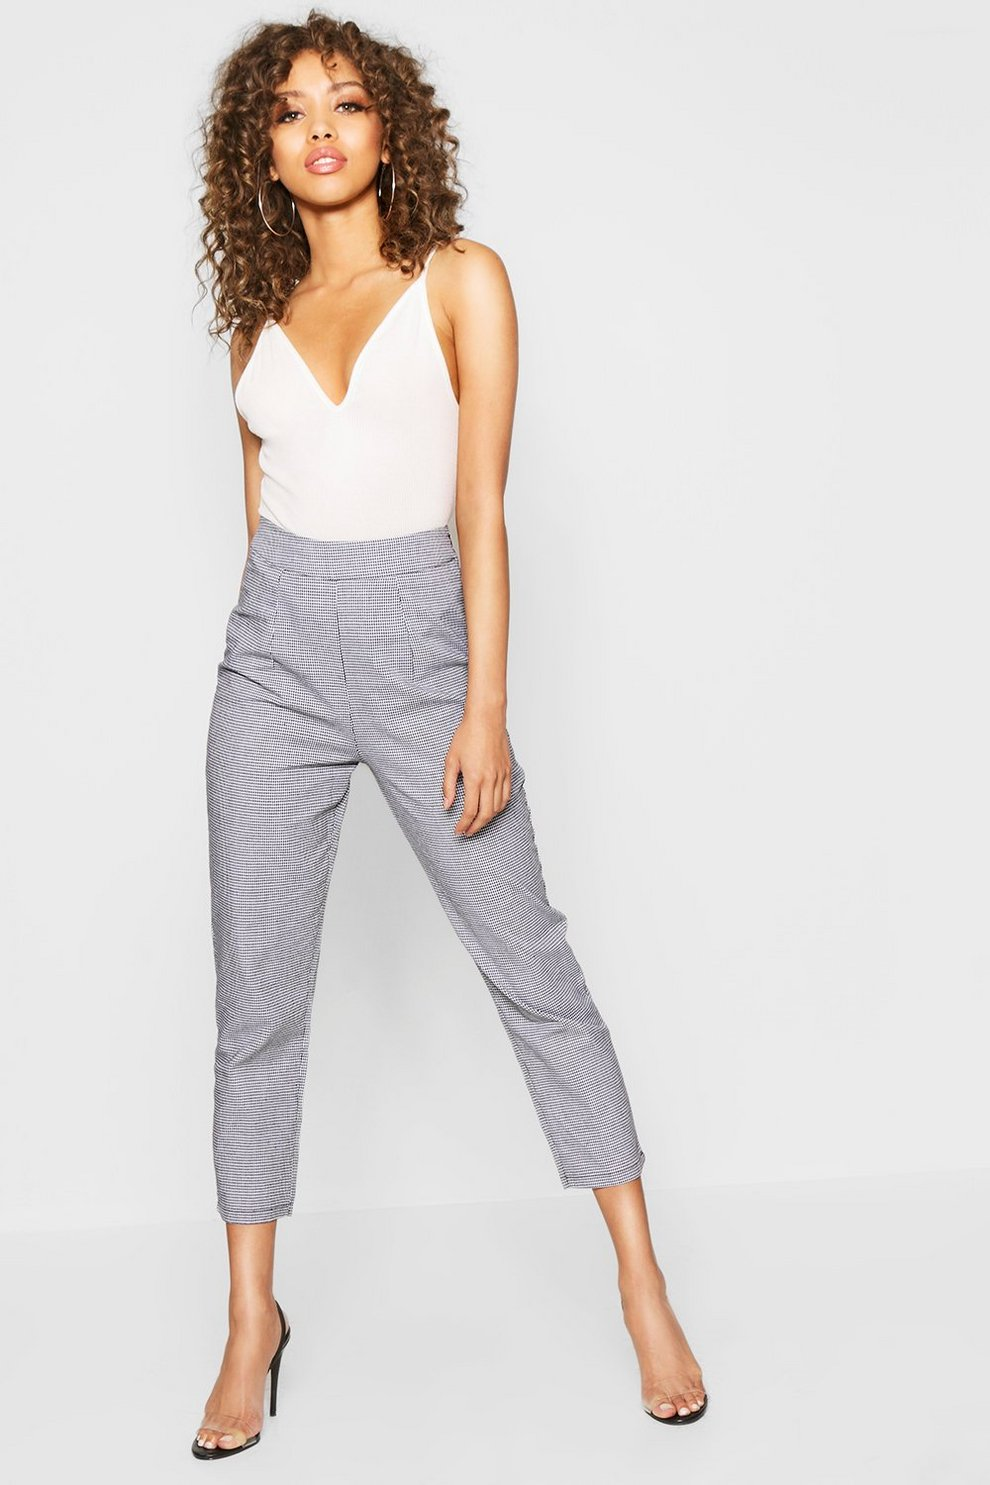 ab6ba09248e5 Woven Dogtooth Slim Fit Trousers | Boohoo